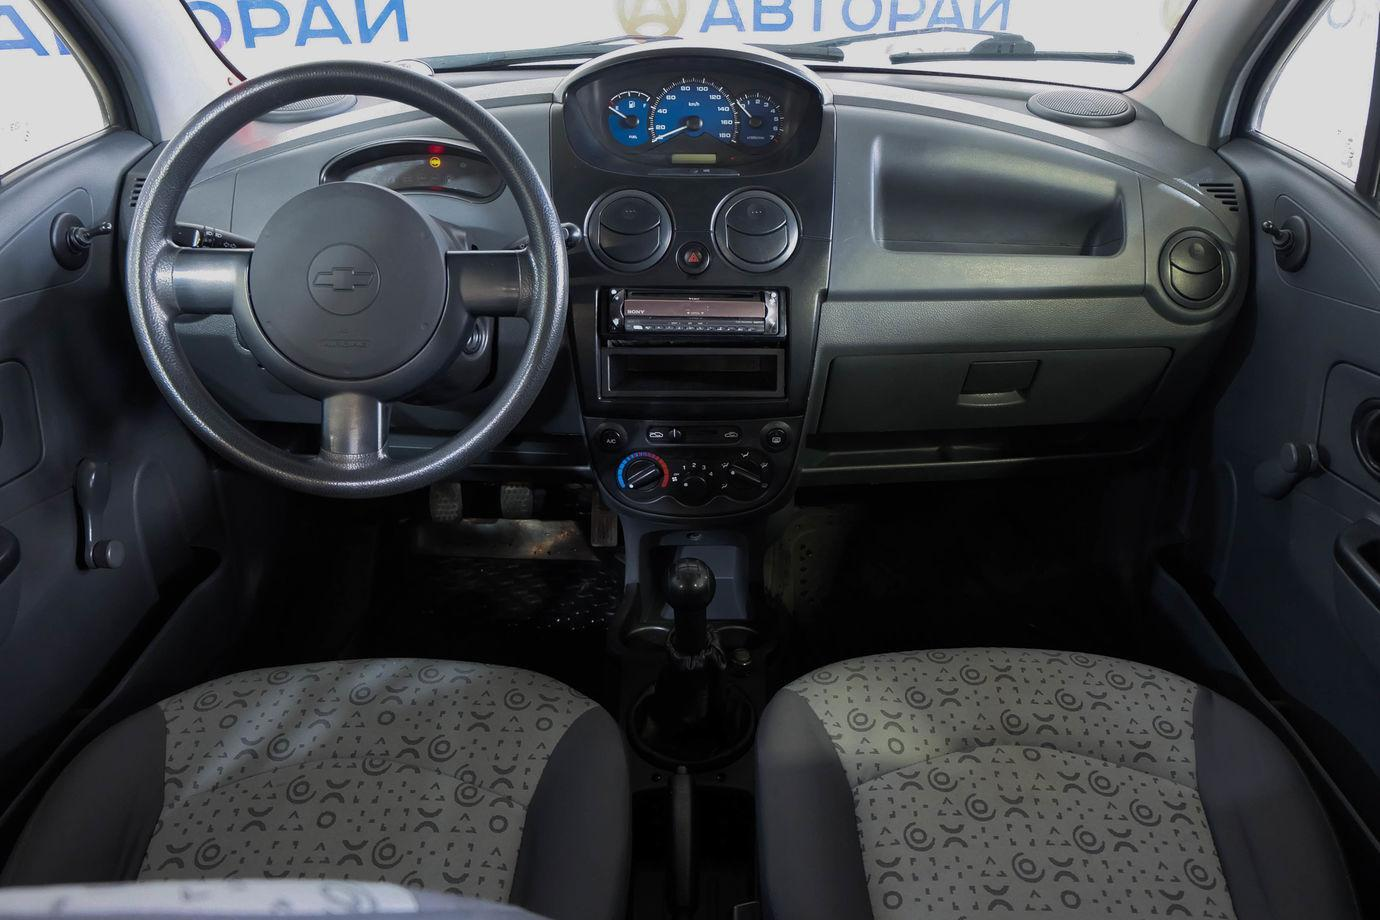 Chevrolet Spark, II 2009г.